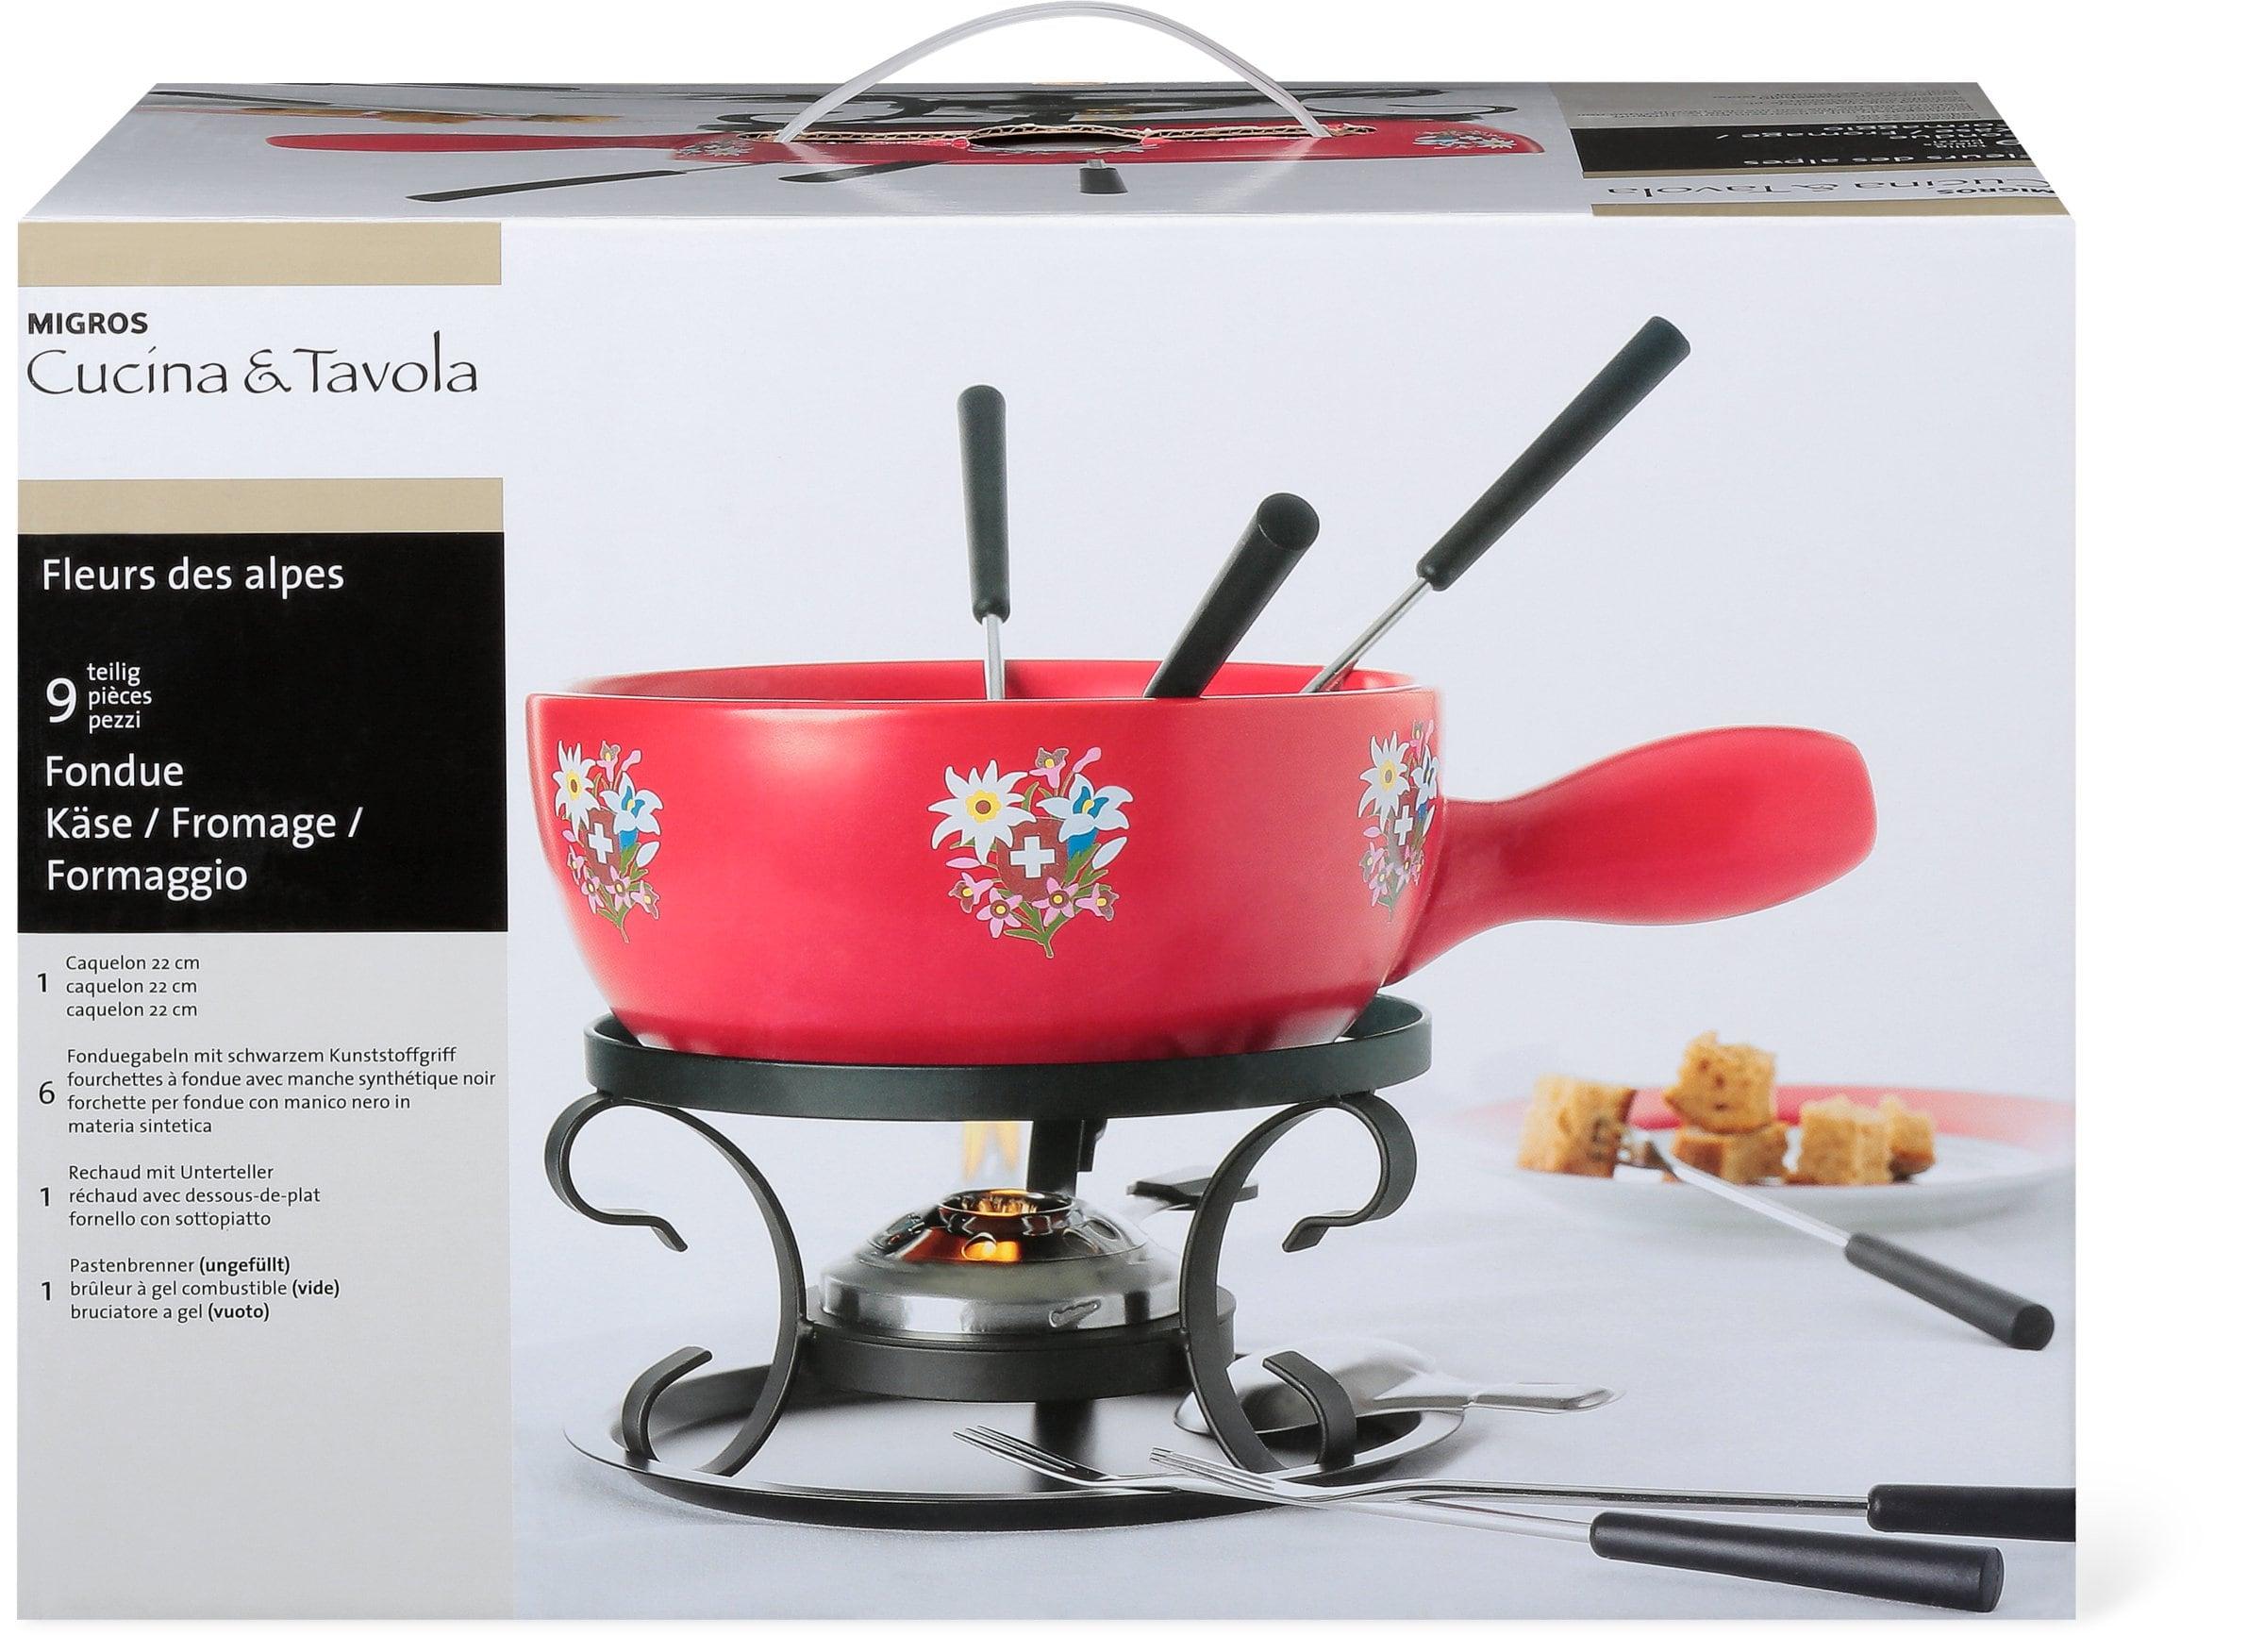 cucina tavola fleurs des alpes k se fondue set migros. Black Bedroom Furniture Sets. Home Design Ideas